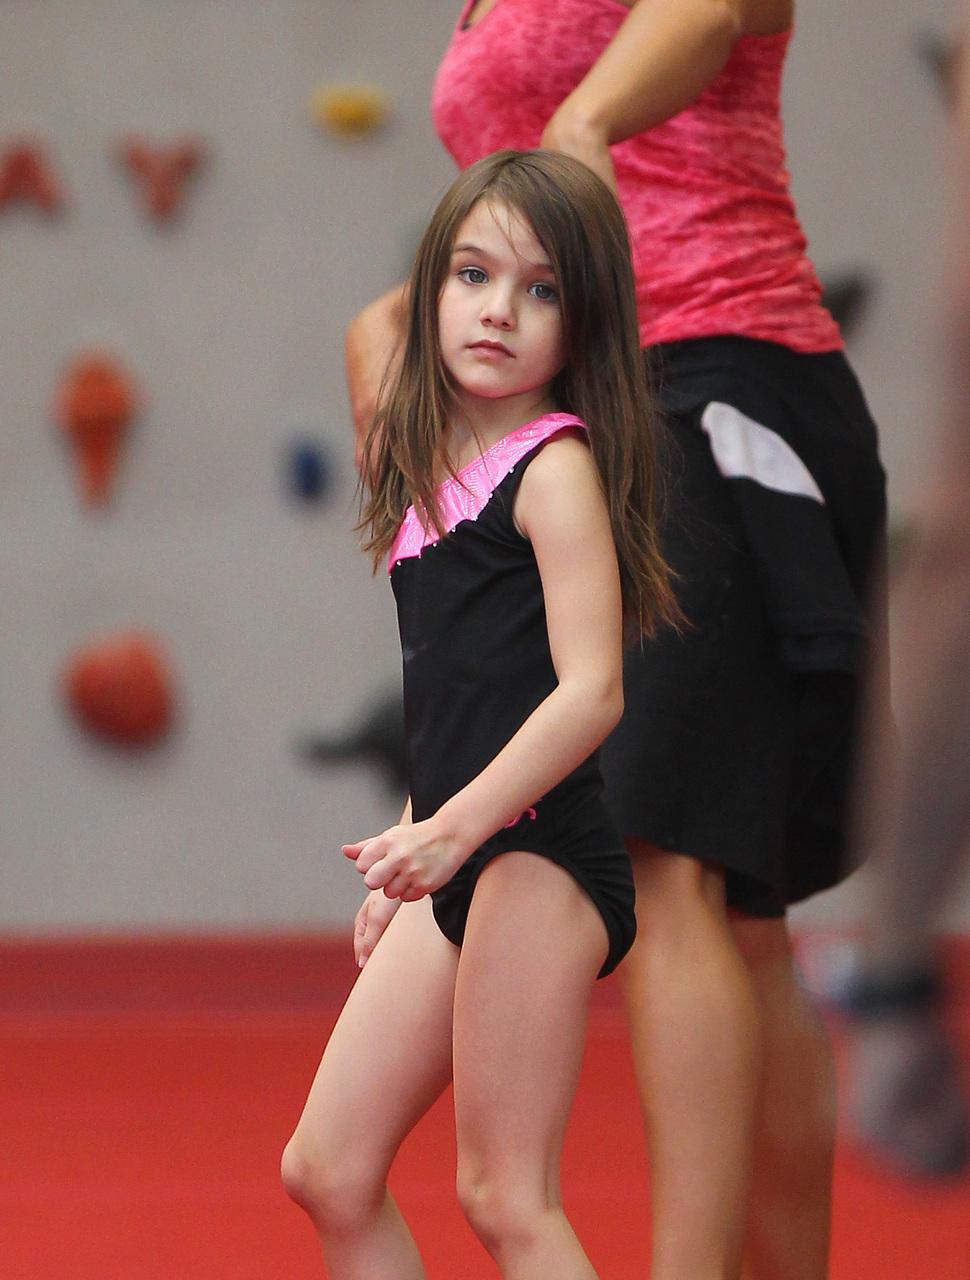 Сури Круз на занятиях гимнастикой